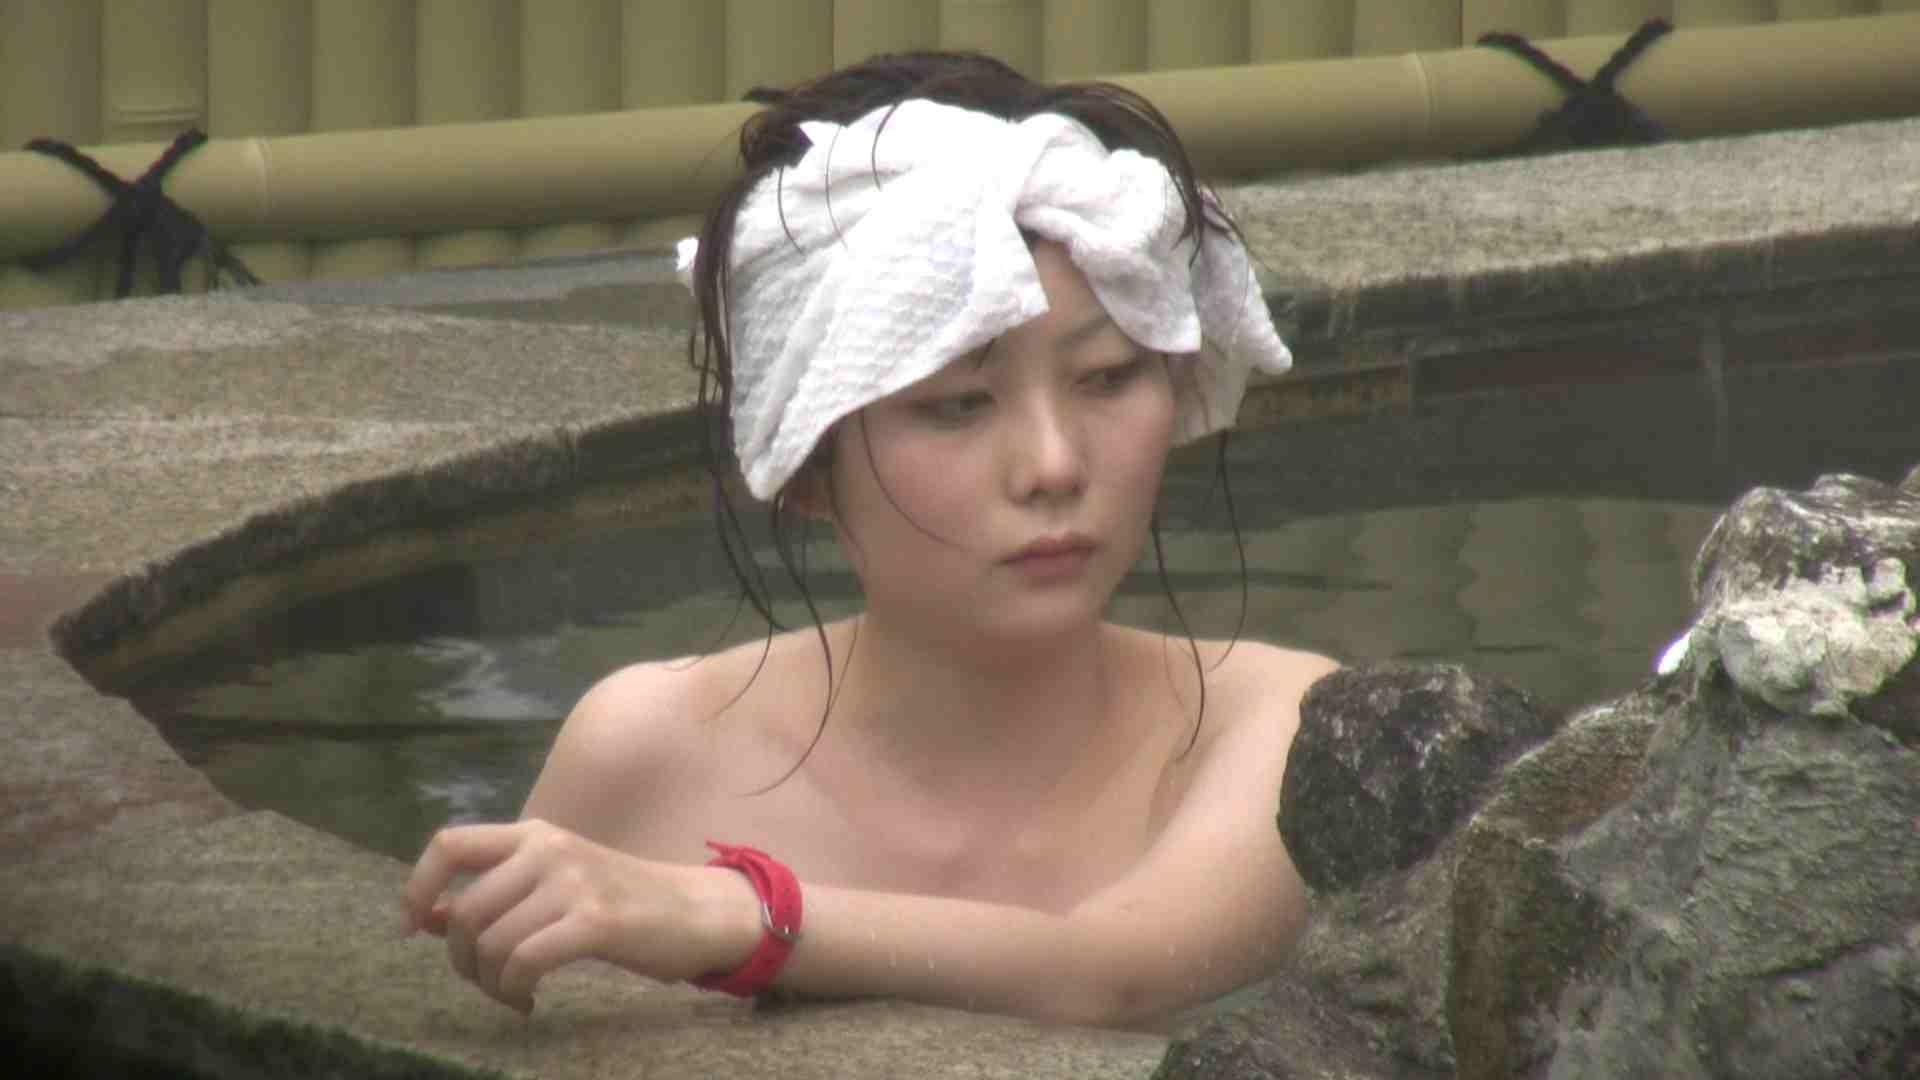 Aquaな露天風呂Vol.147 露天 濡れ場動画紹介 85画像 35